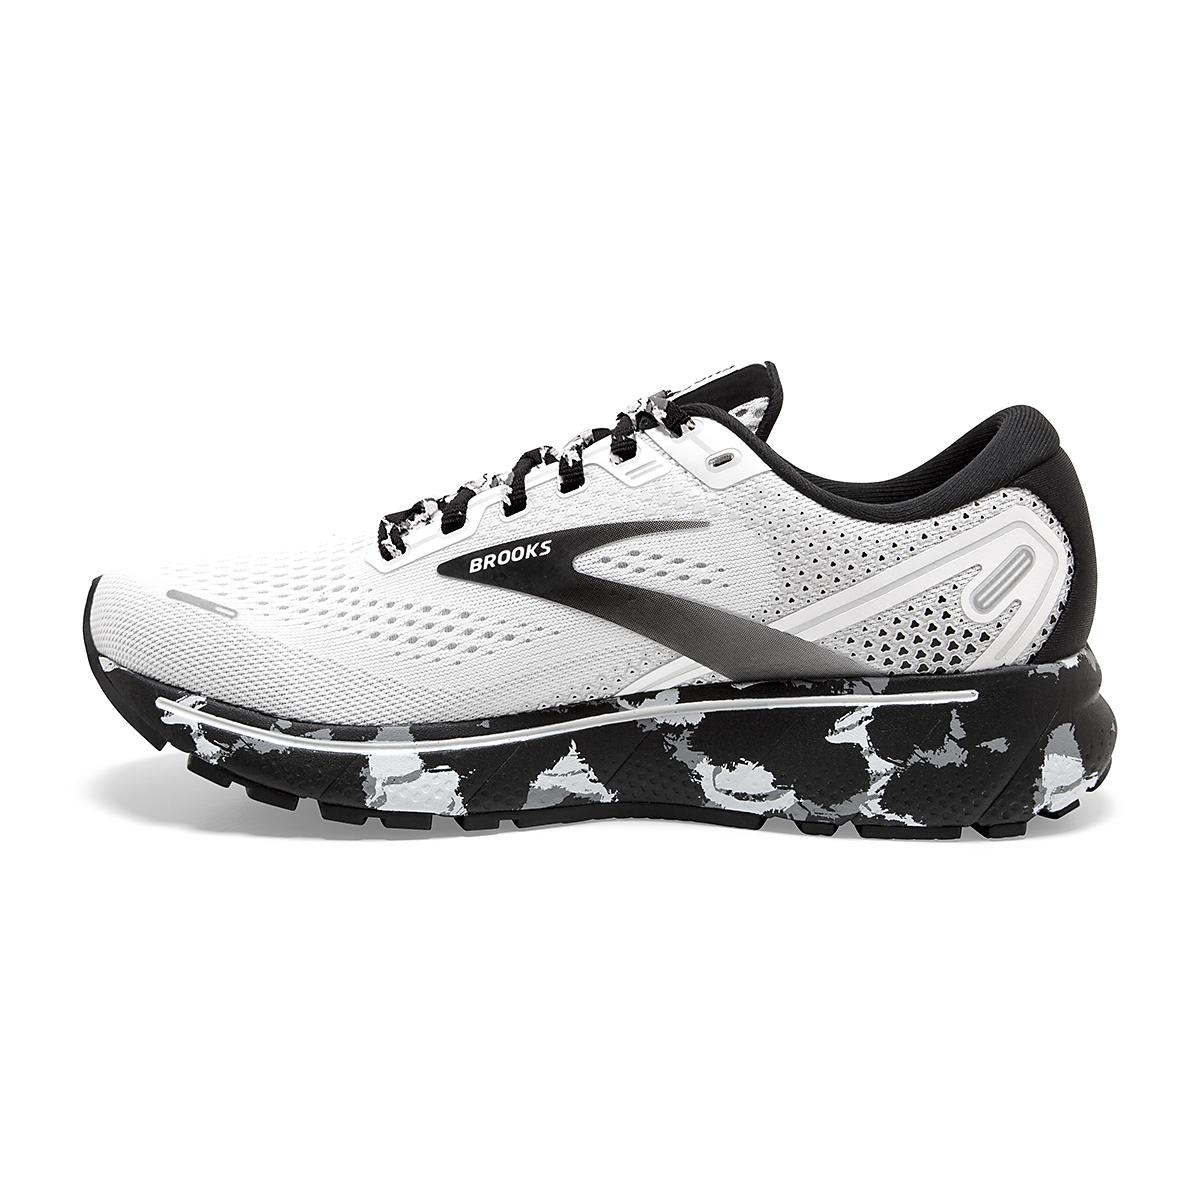 Women's Brooks Ghost 14 Running Shoe - Color: White/Grey/Black - Size: 5 - Width: Regular, White/Grey/Black, large, image 4